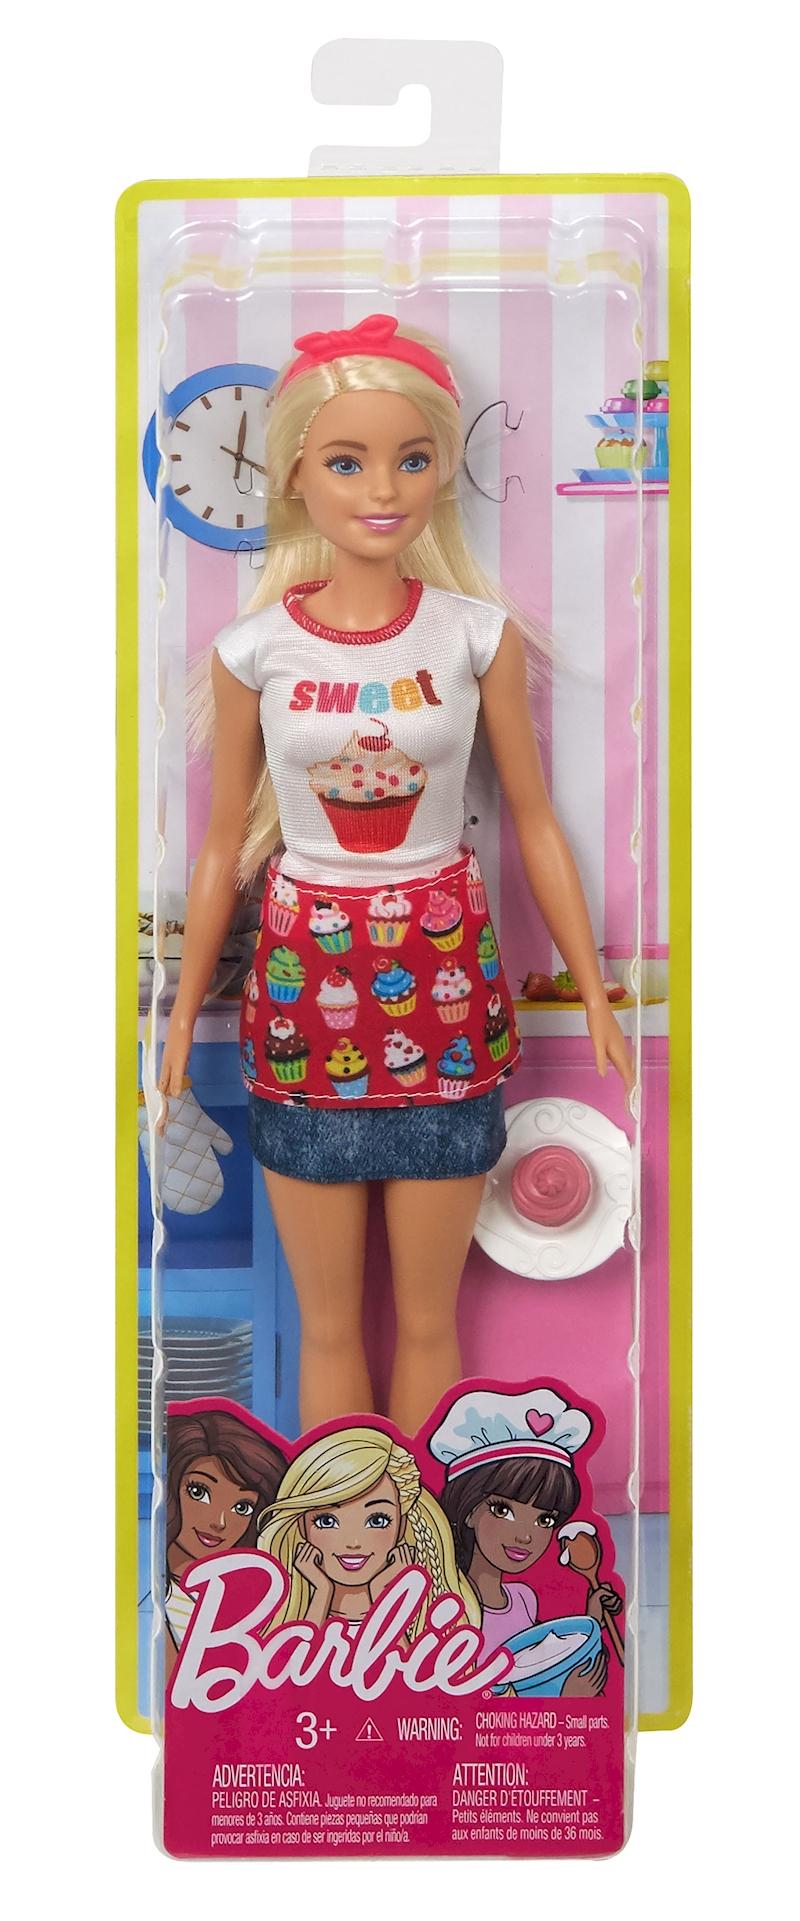 barbie doll - Barbie Fe